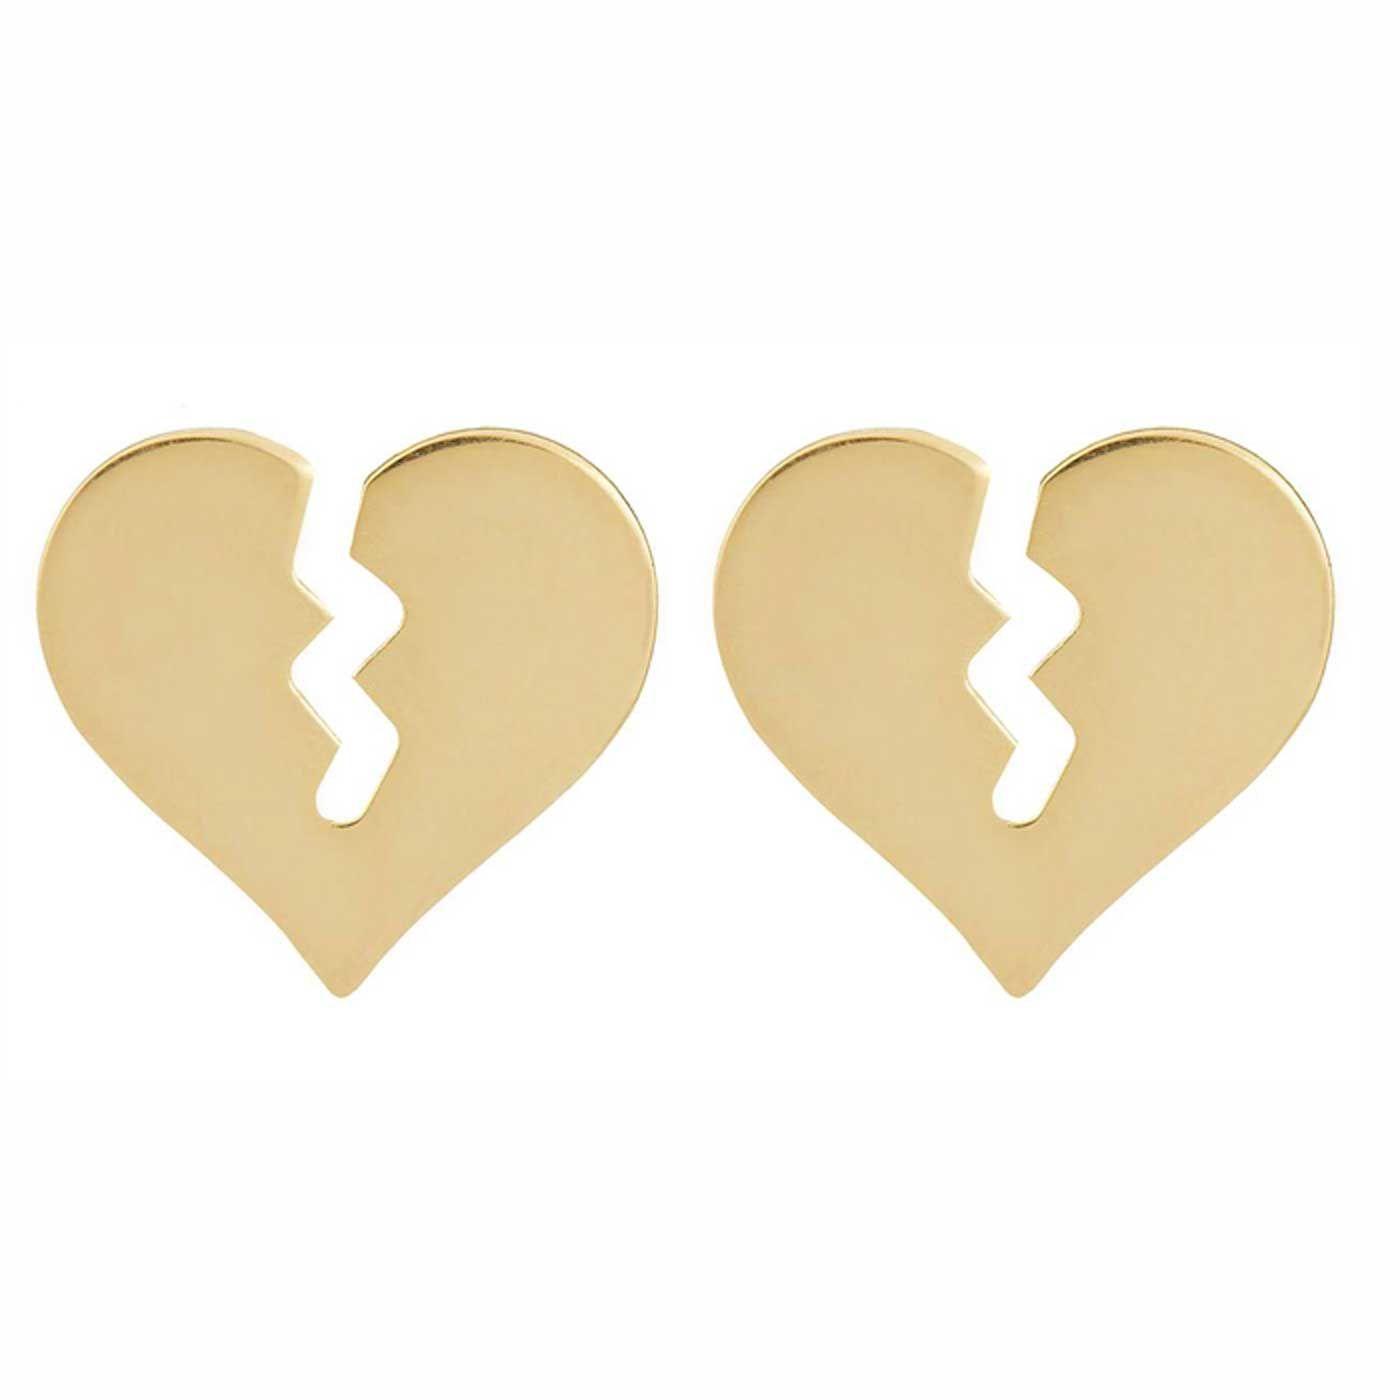 گوشواره طلا 18 عیار زنانه کانیار گالری کد GOA112 -  - 3